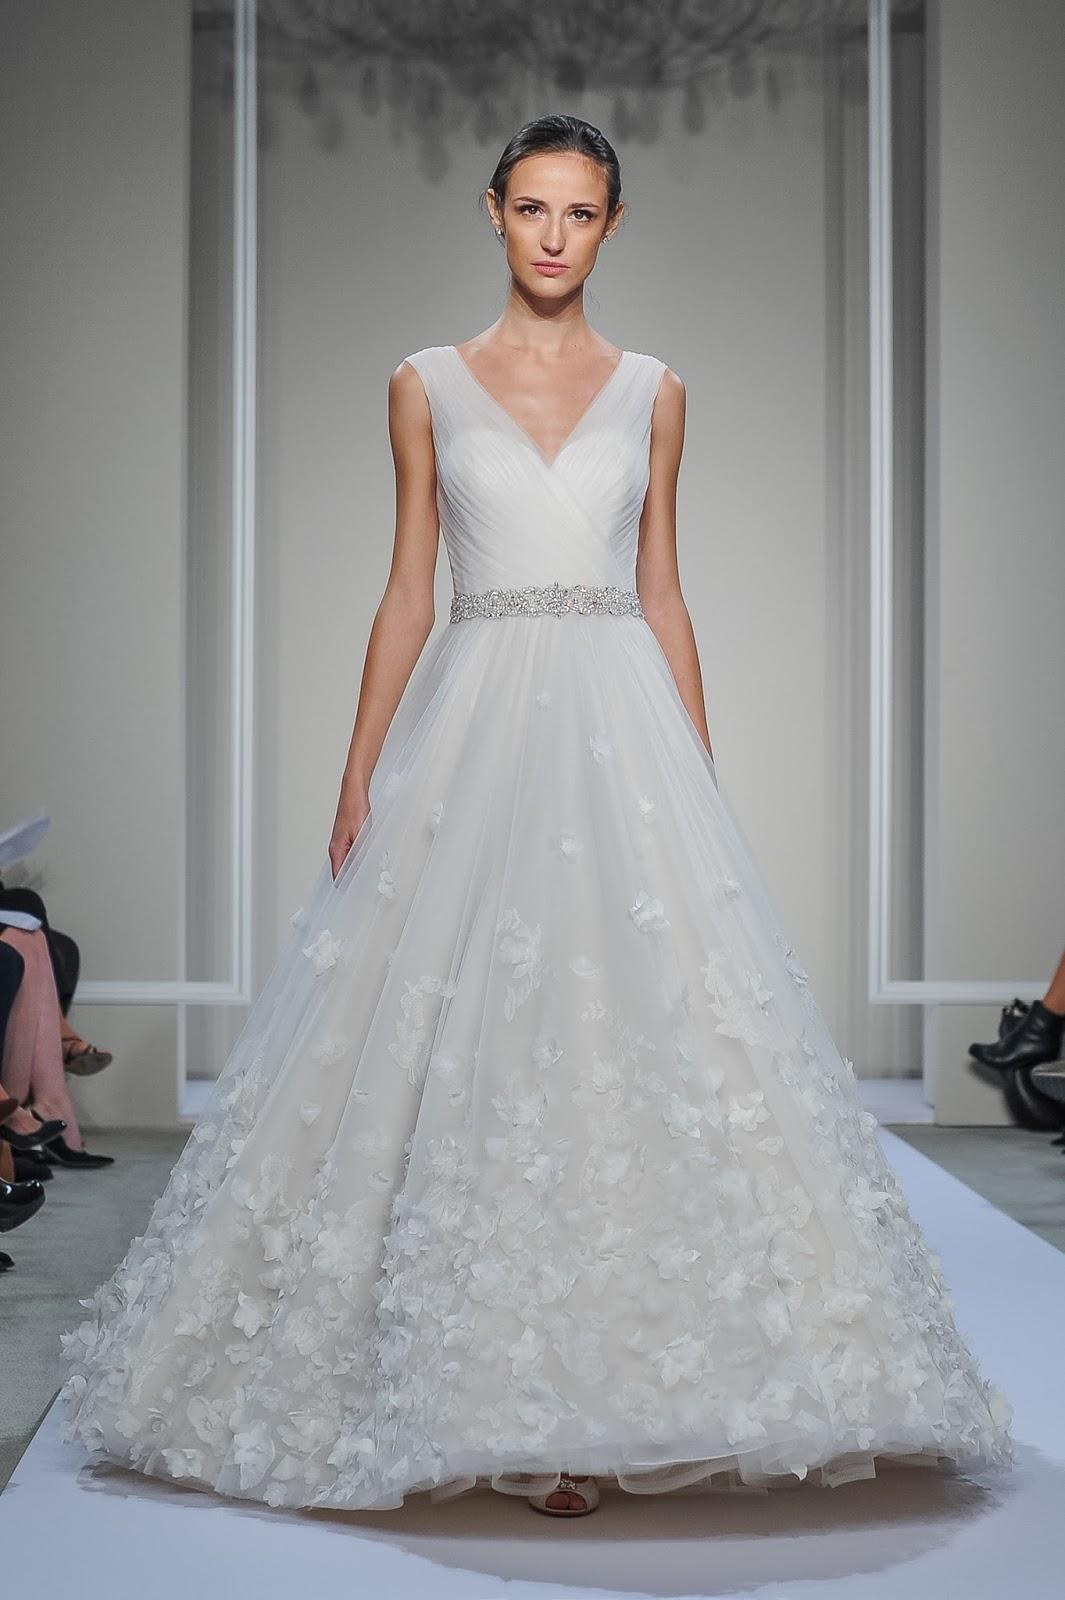 Panina Wedding Dress Designer 96 Trend A Tale of Three